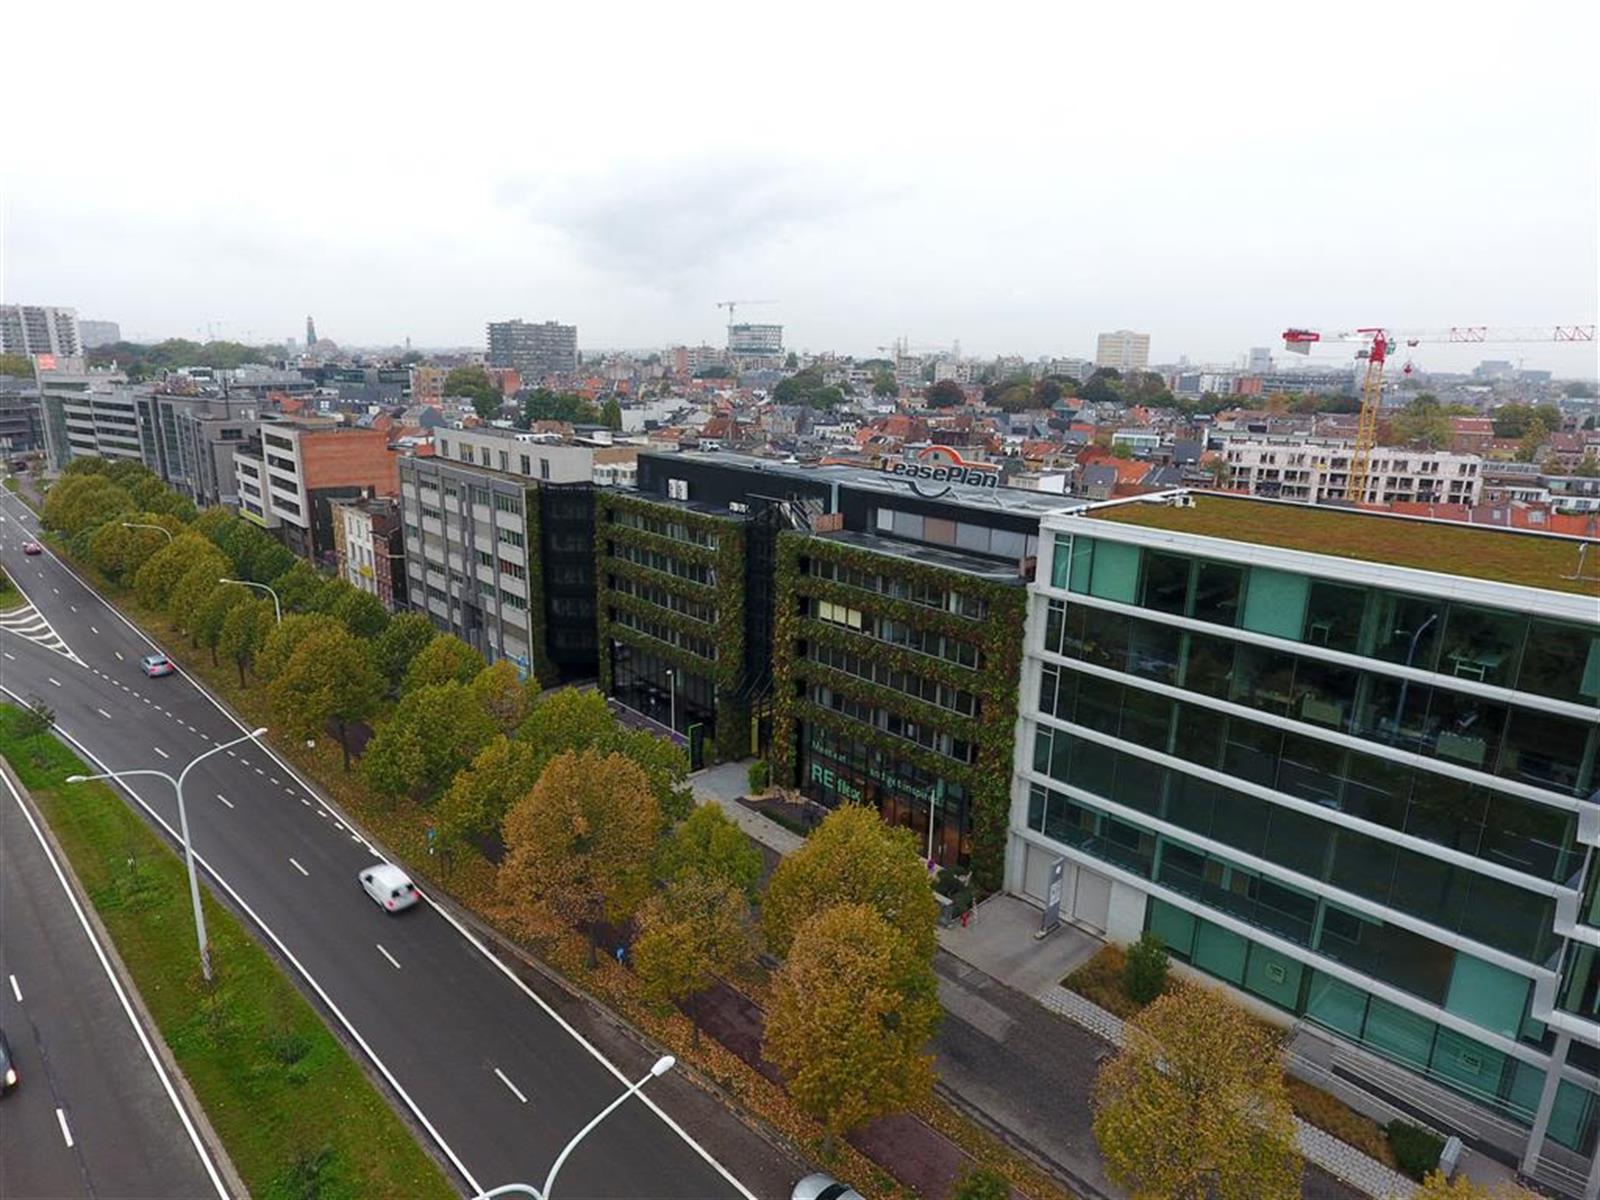 kantoor te huur Serviced Office 5.6 - Uitbreidingstraat 66, 2600 Antwerpen, België 4